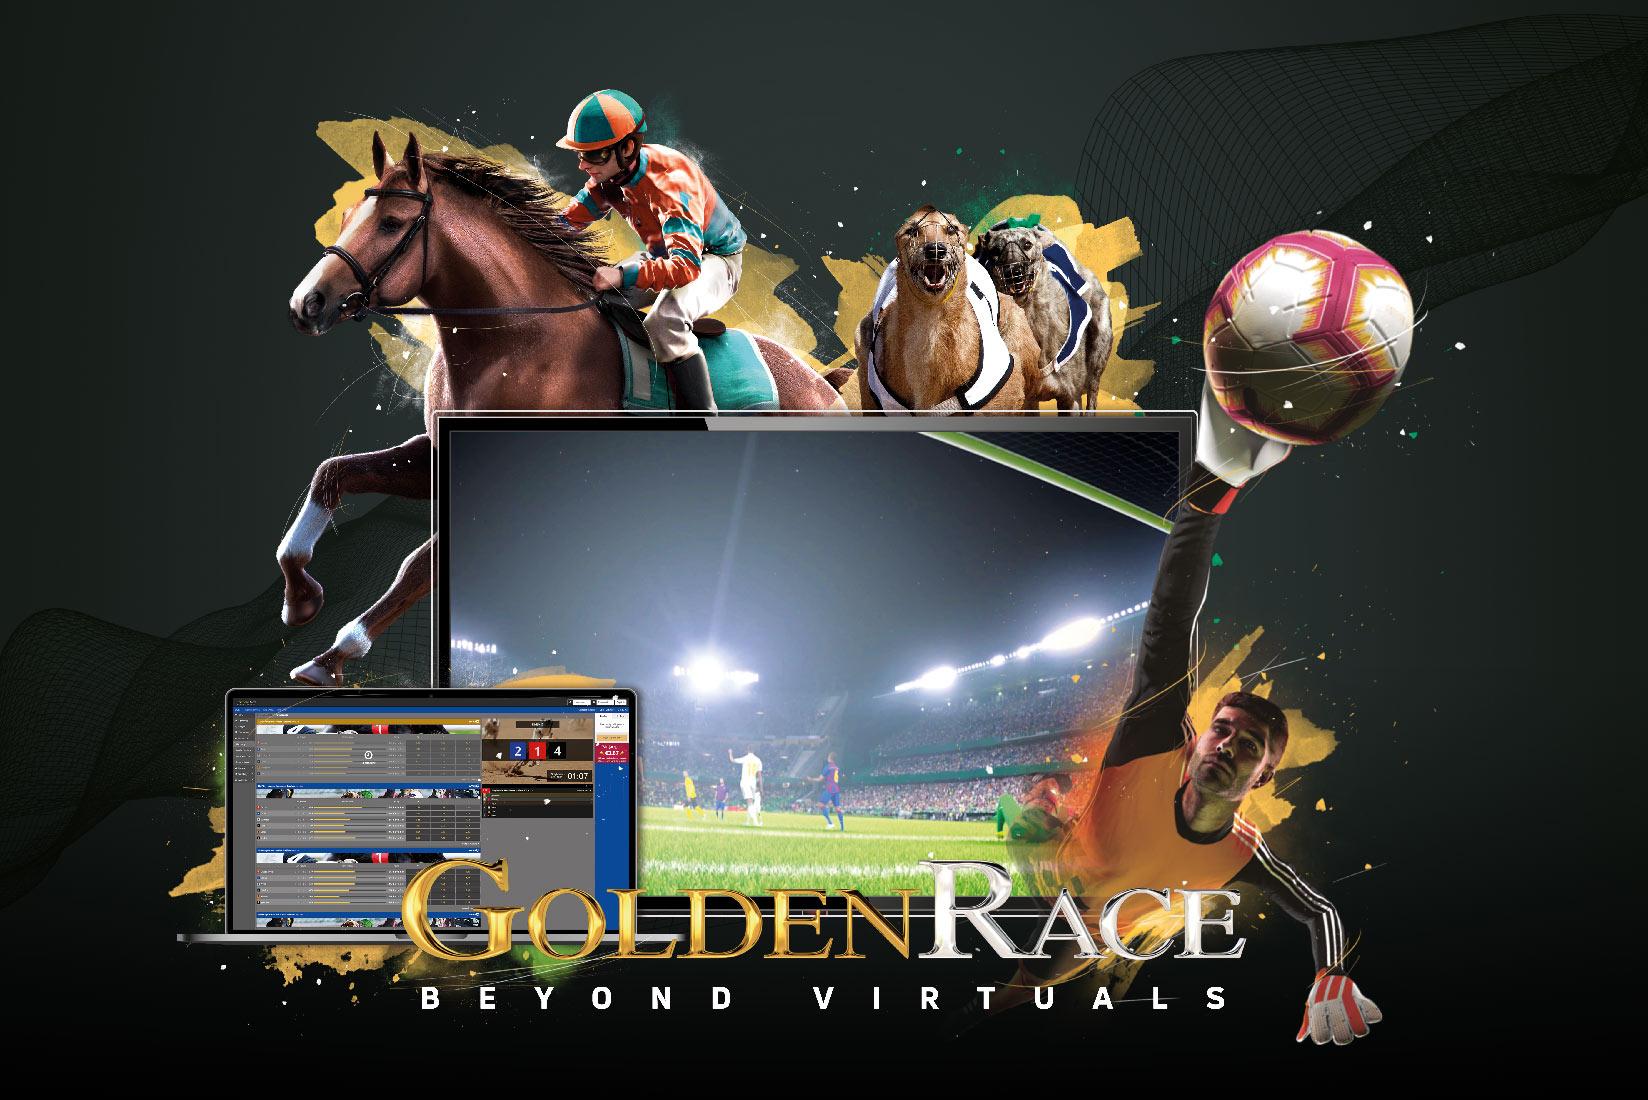 Golden Race to reach new betting platforms through Emara Play Agreggator